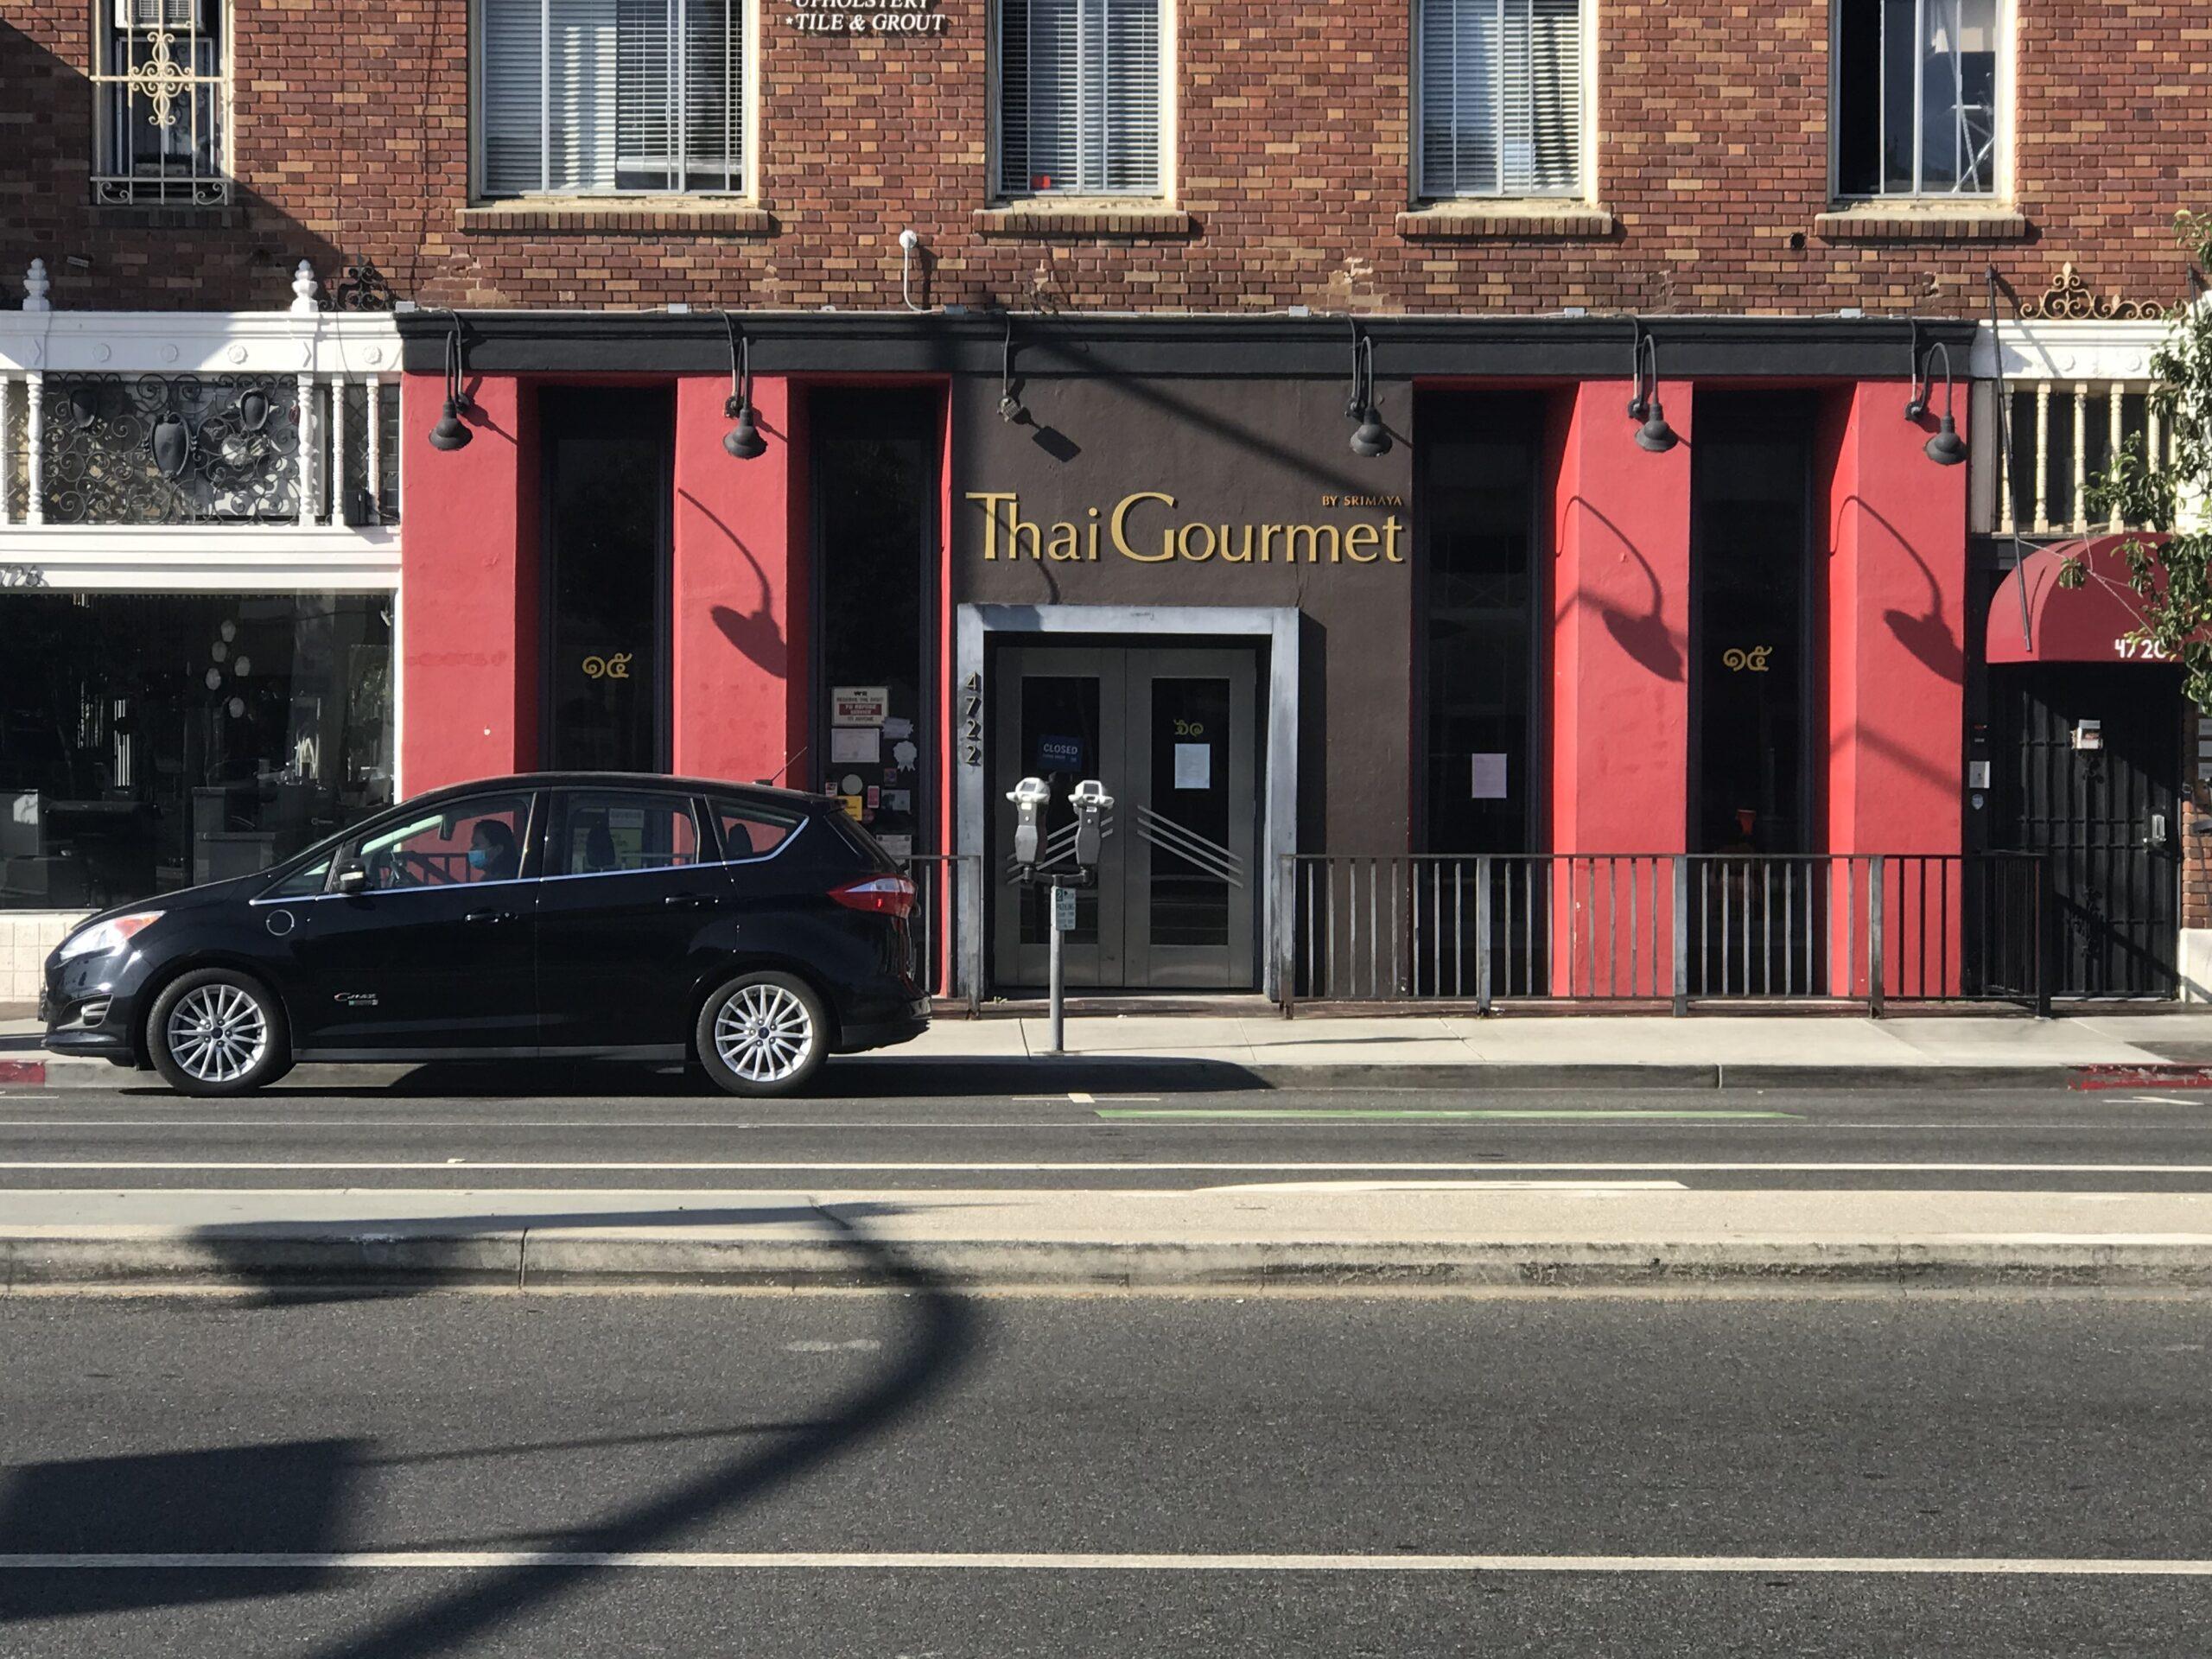 Thai Gourmet to close Belmont Shore location on Aug. 25 • the Hi-lo